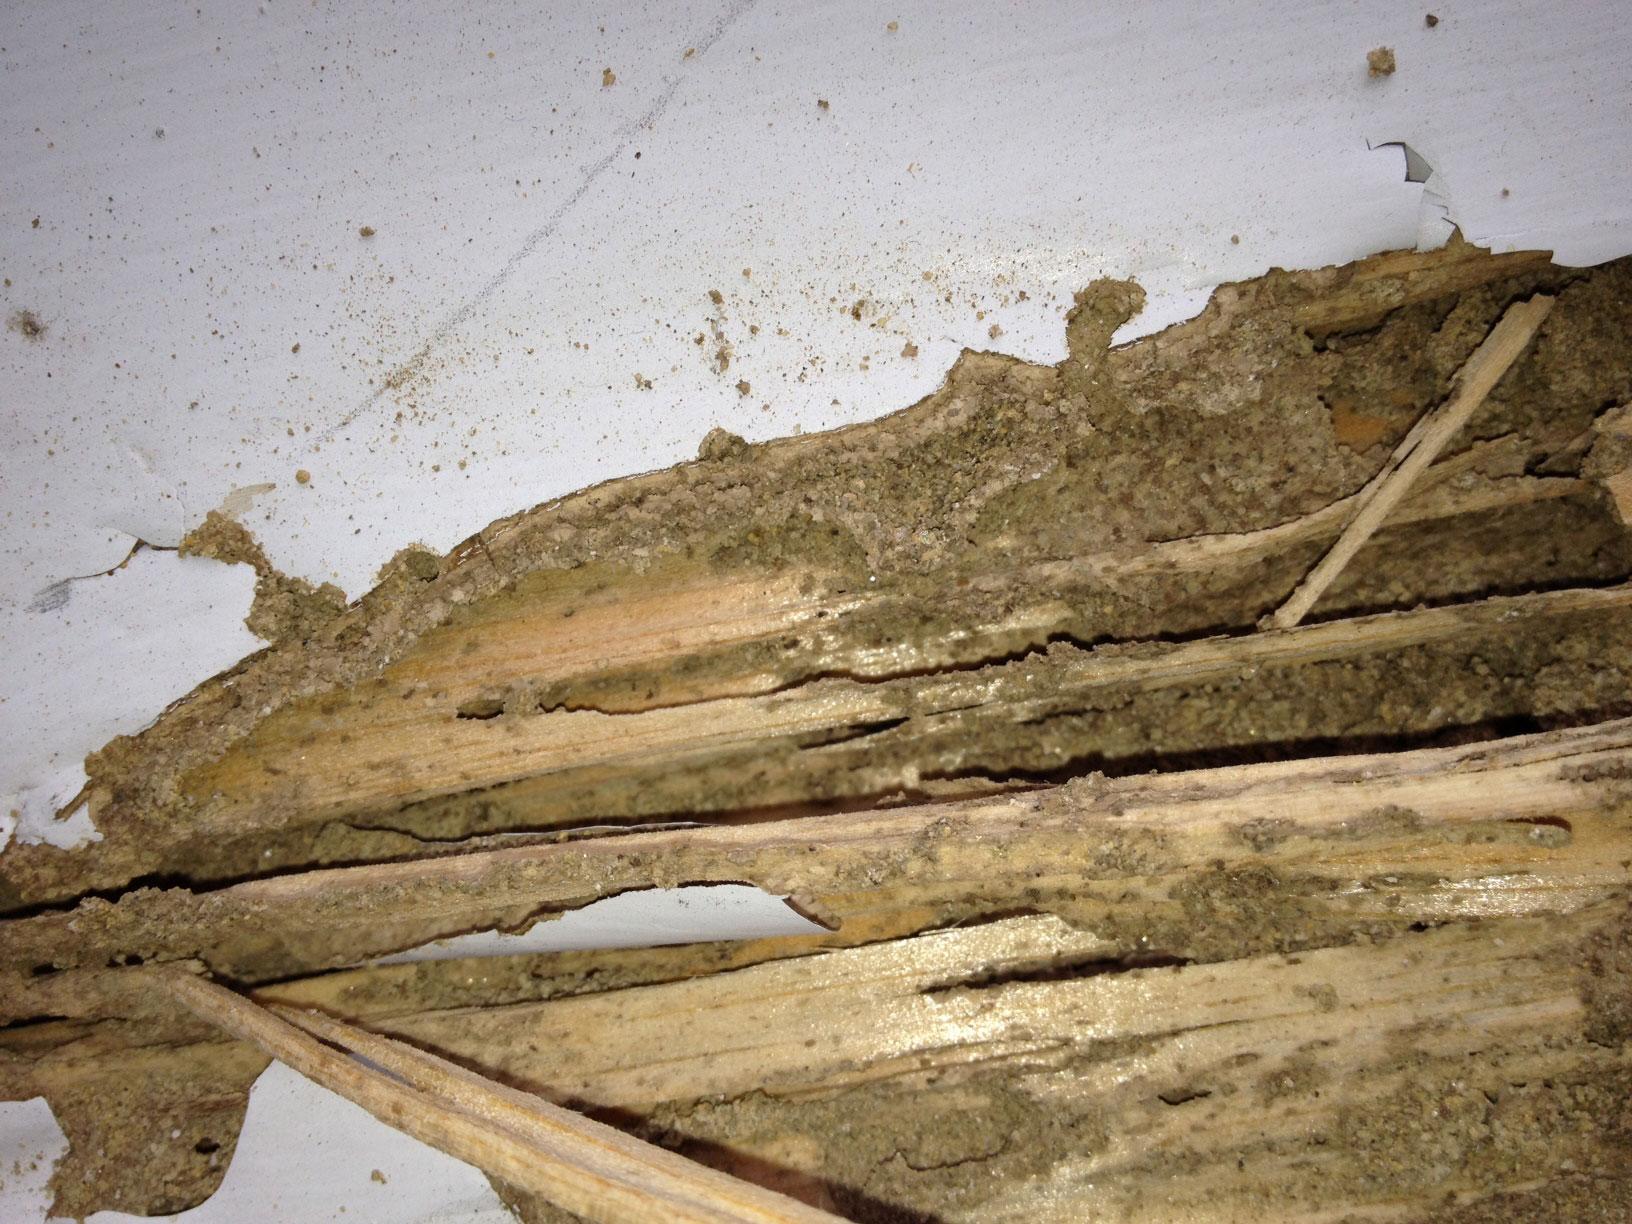 termite damage vs water damage